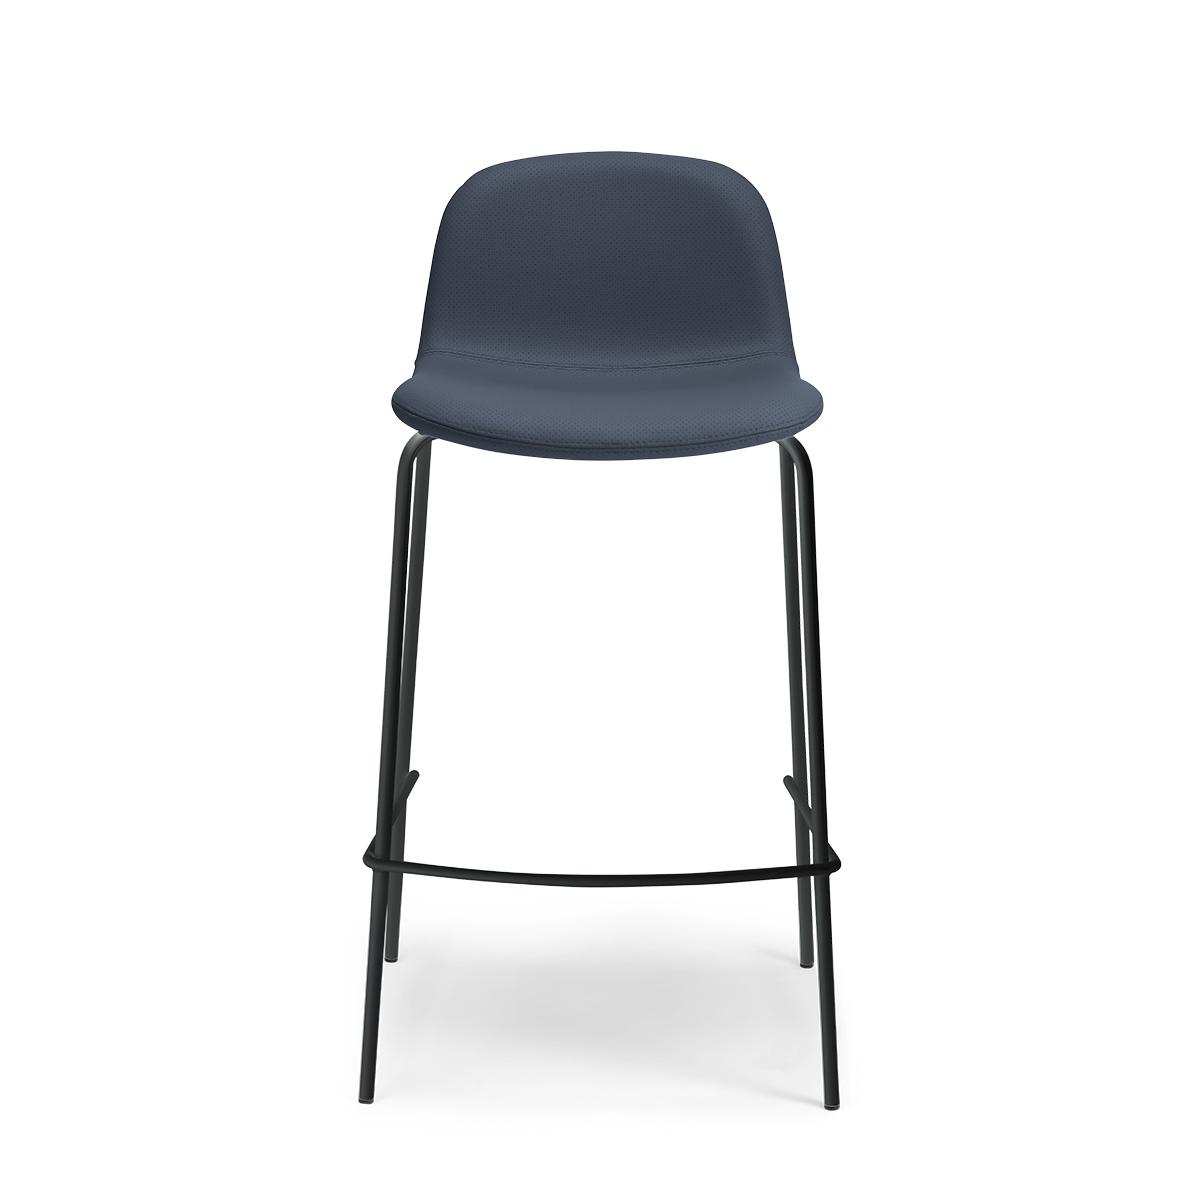 Chaise de bar Monza pieds noirs cuir perforé bleu marine